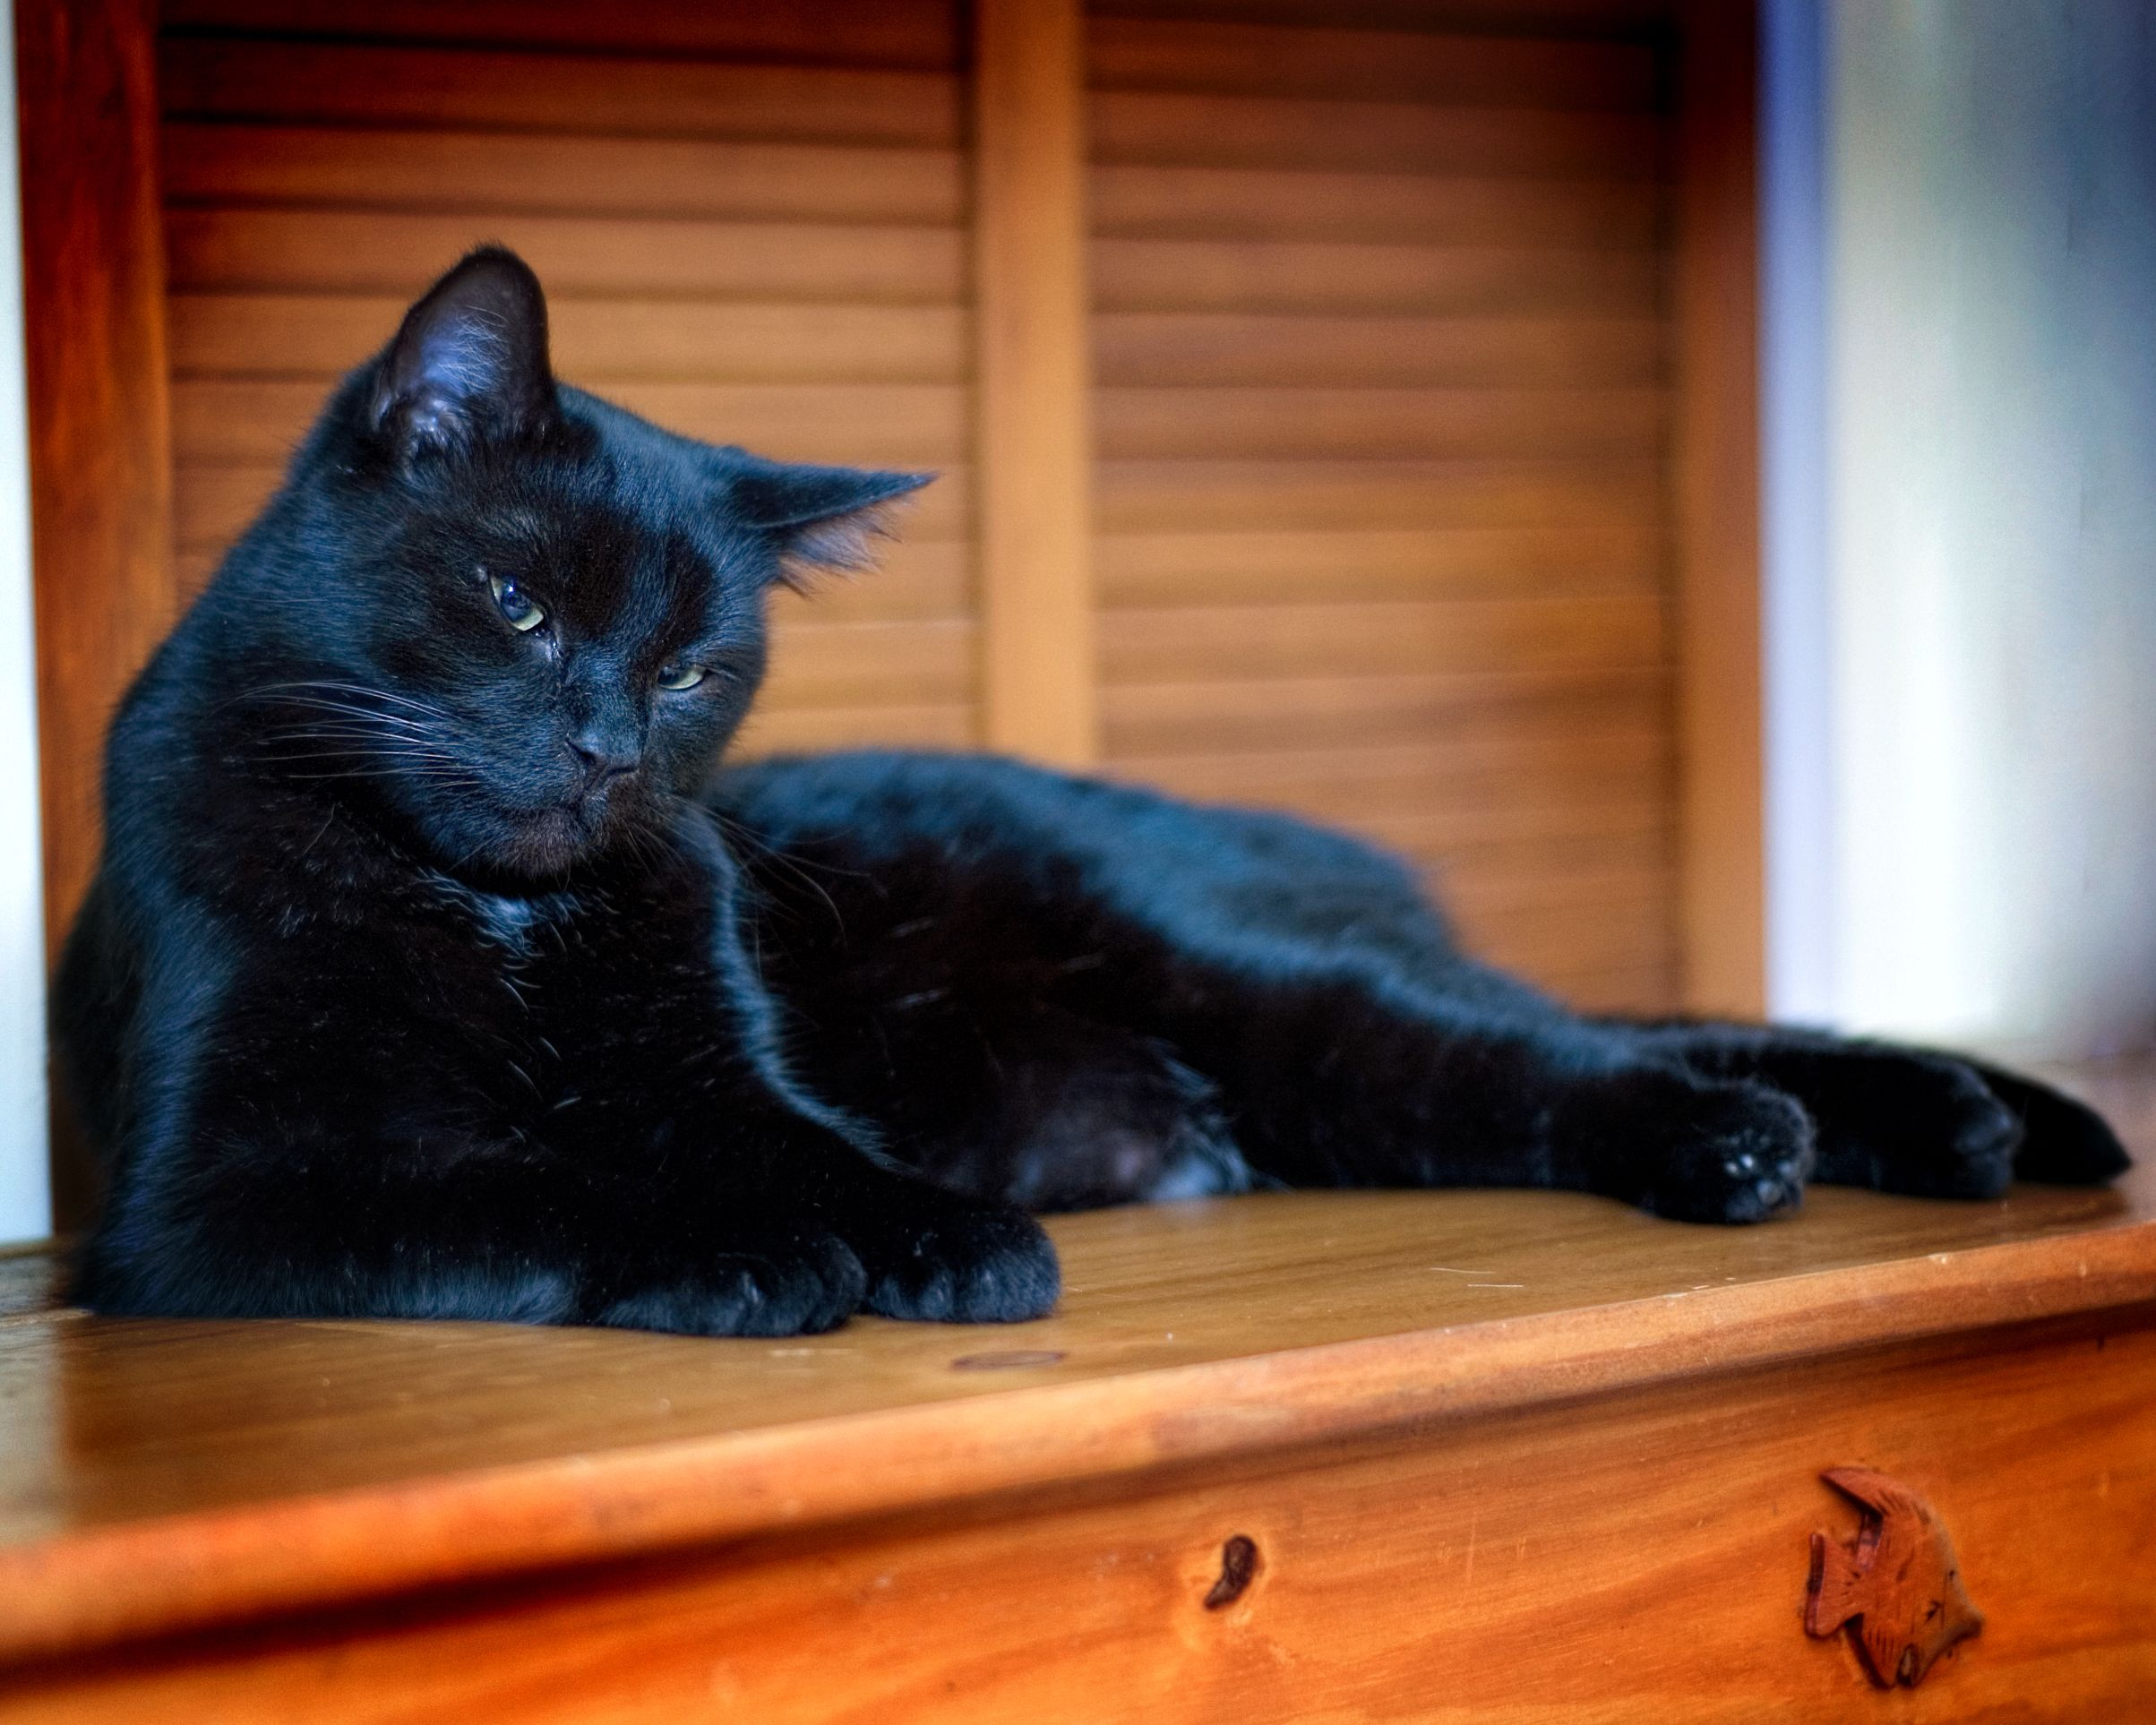 My Aunt's Black Cat - Mr Sparks